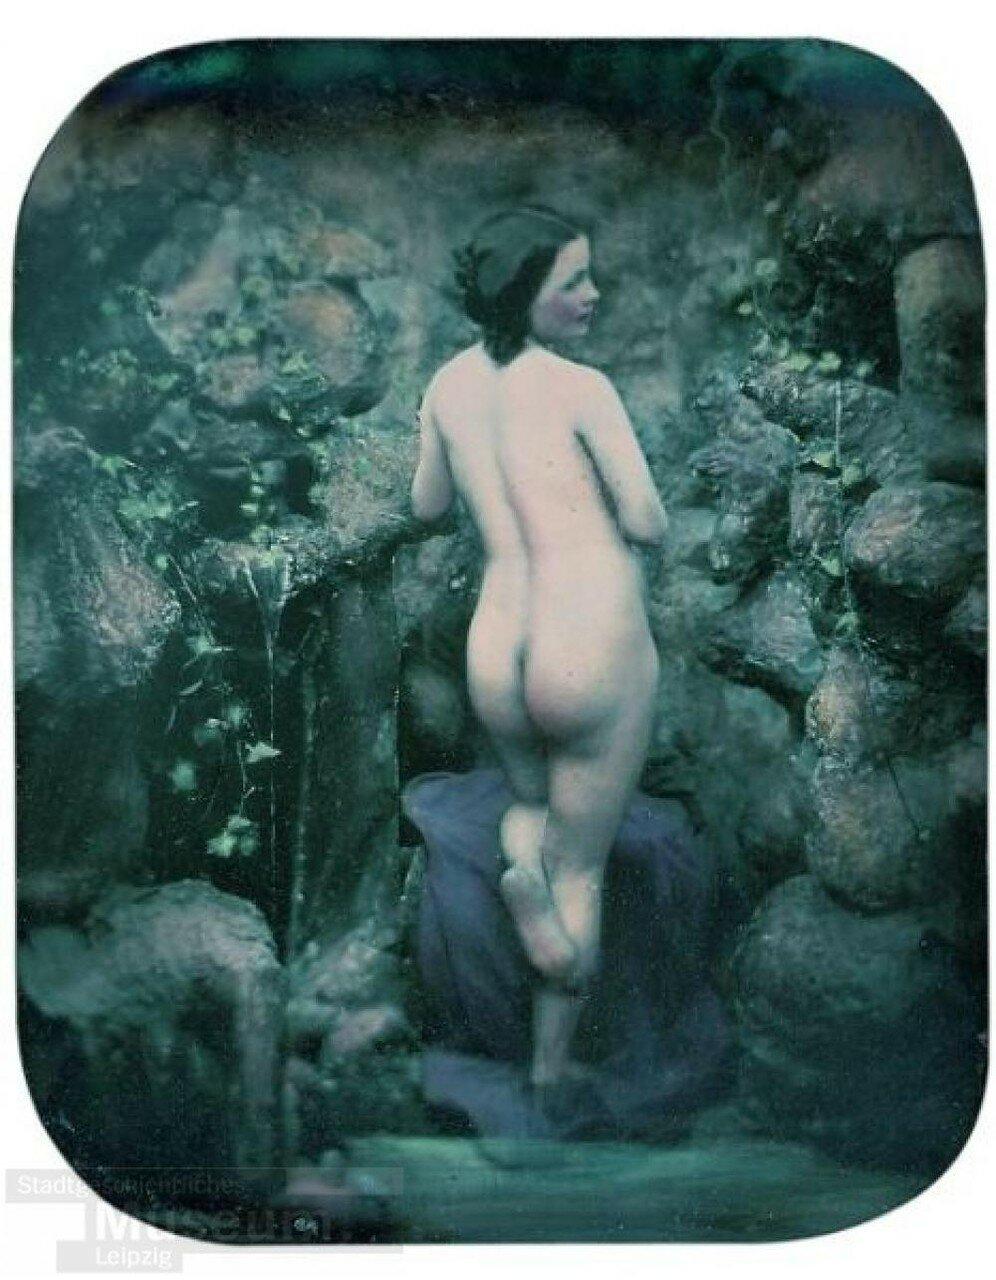 1850-е. Обнаженная женщина в гроте.  Феликс Жак-Антуан Мулен